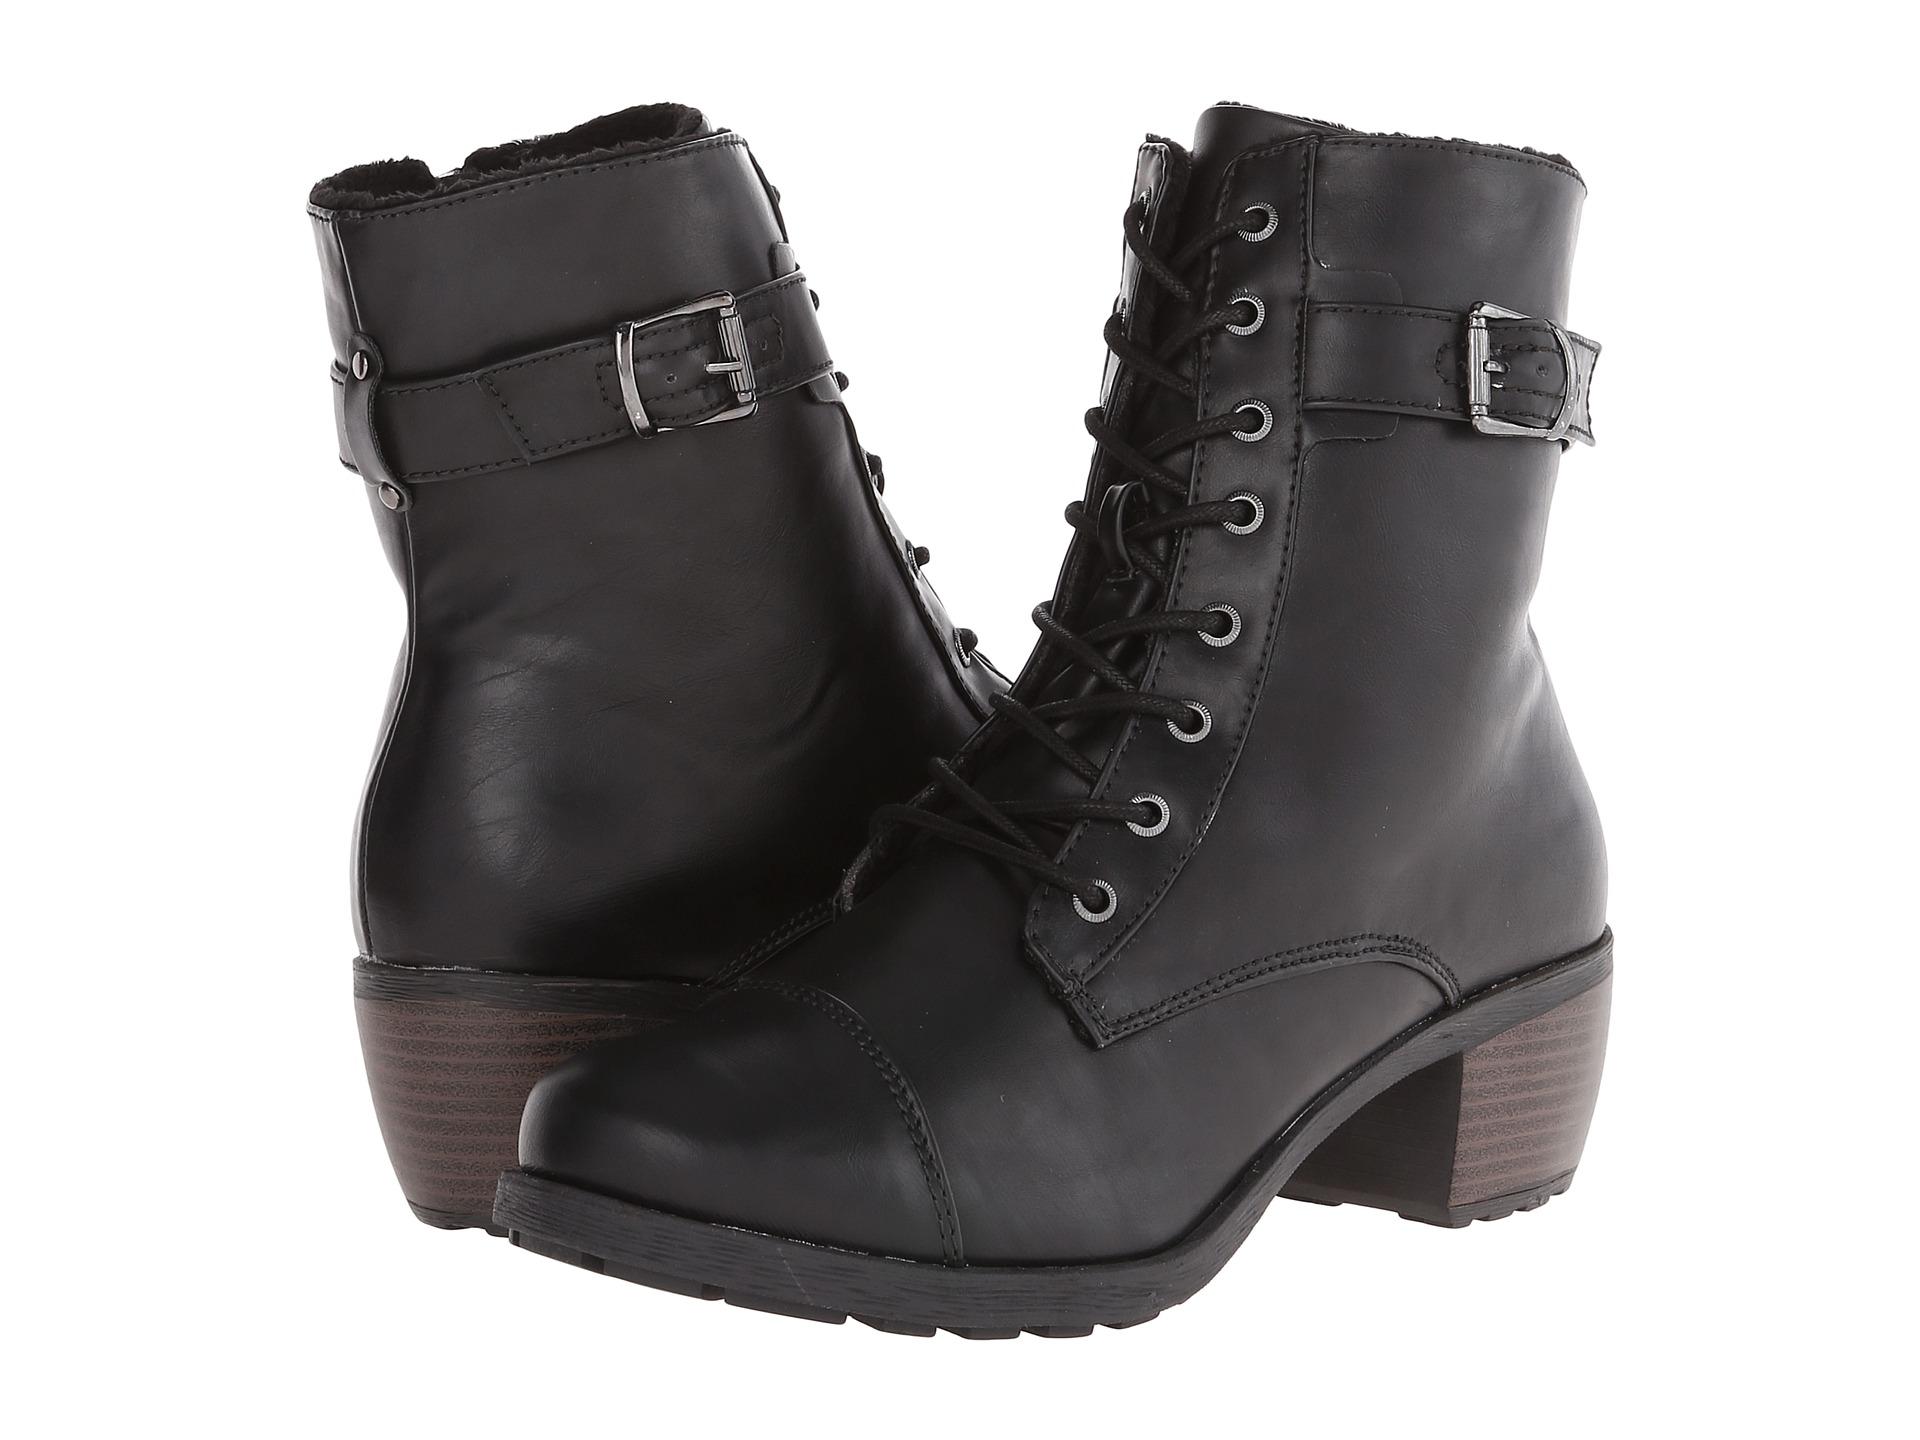 26 Elegant Khombu Womens Boots Reviews Sobatapkcom